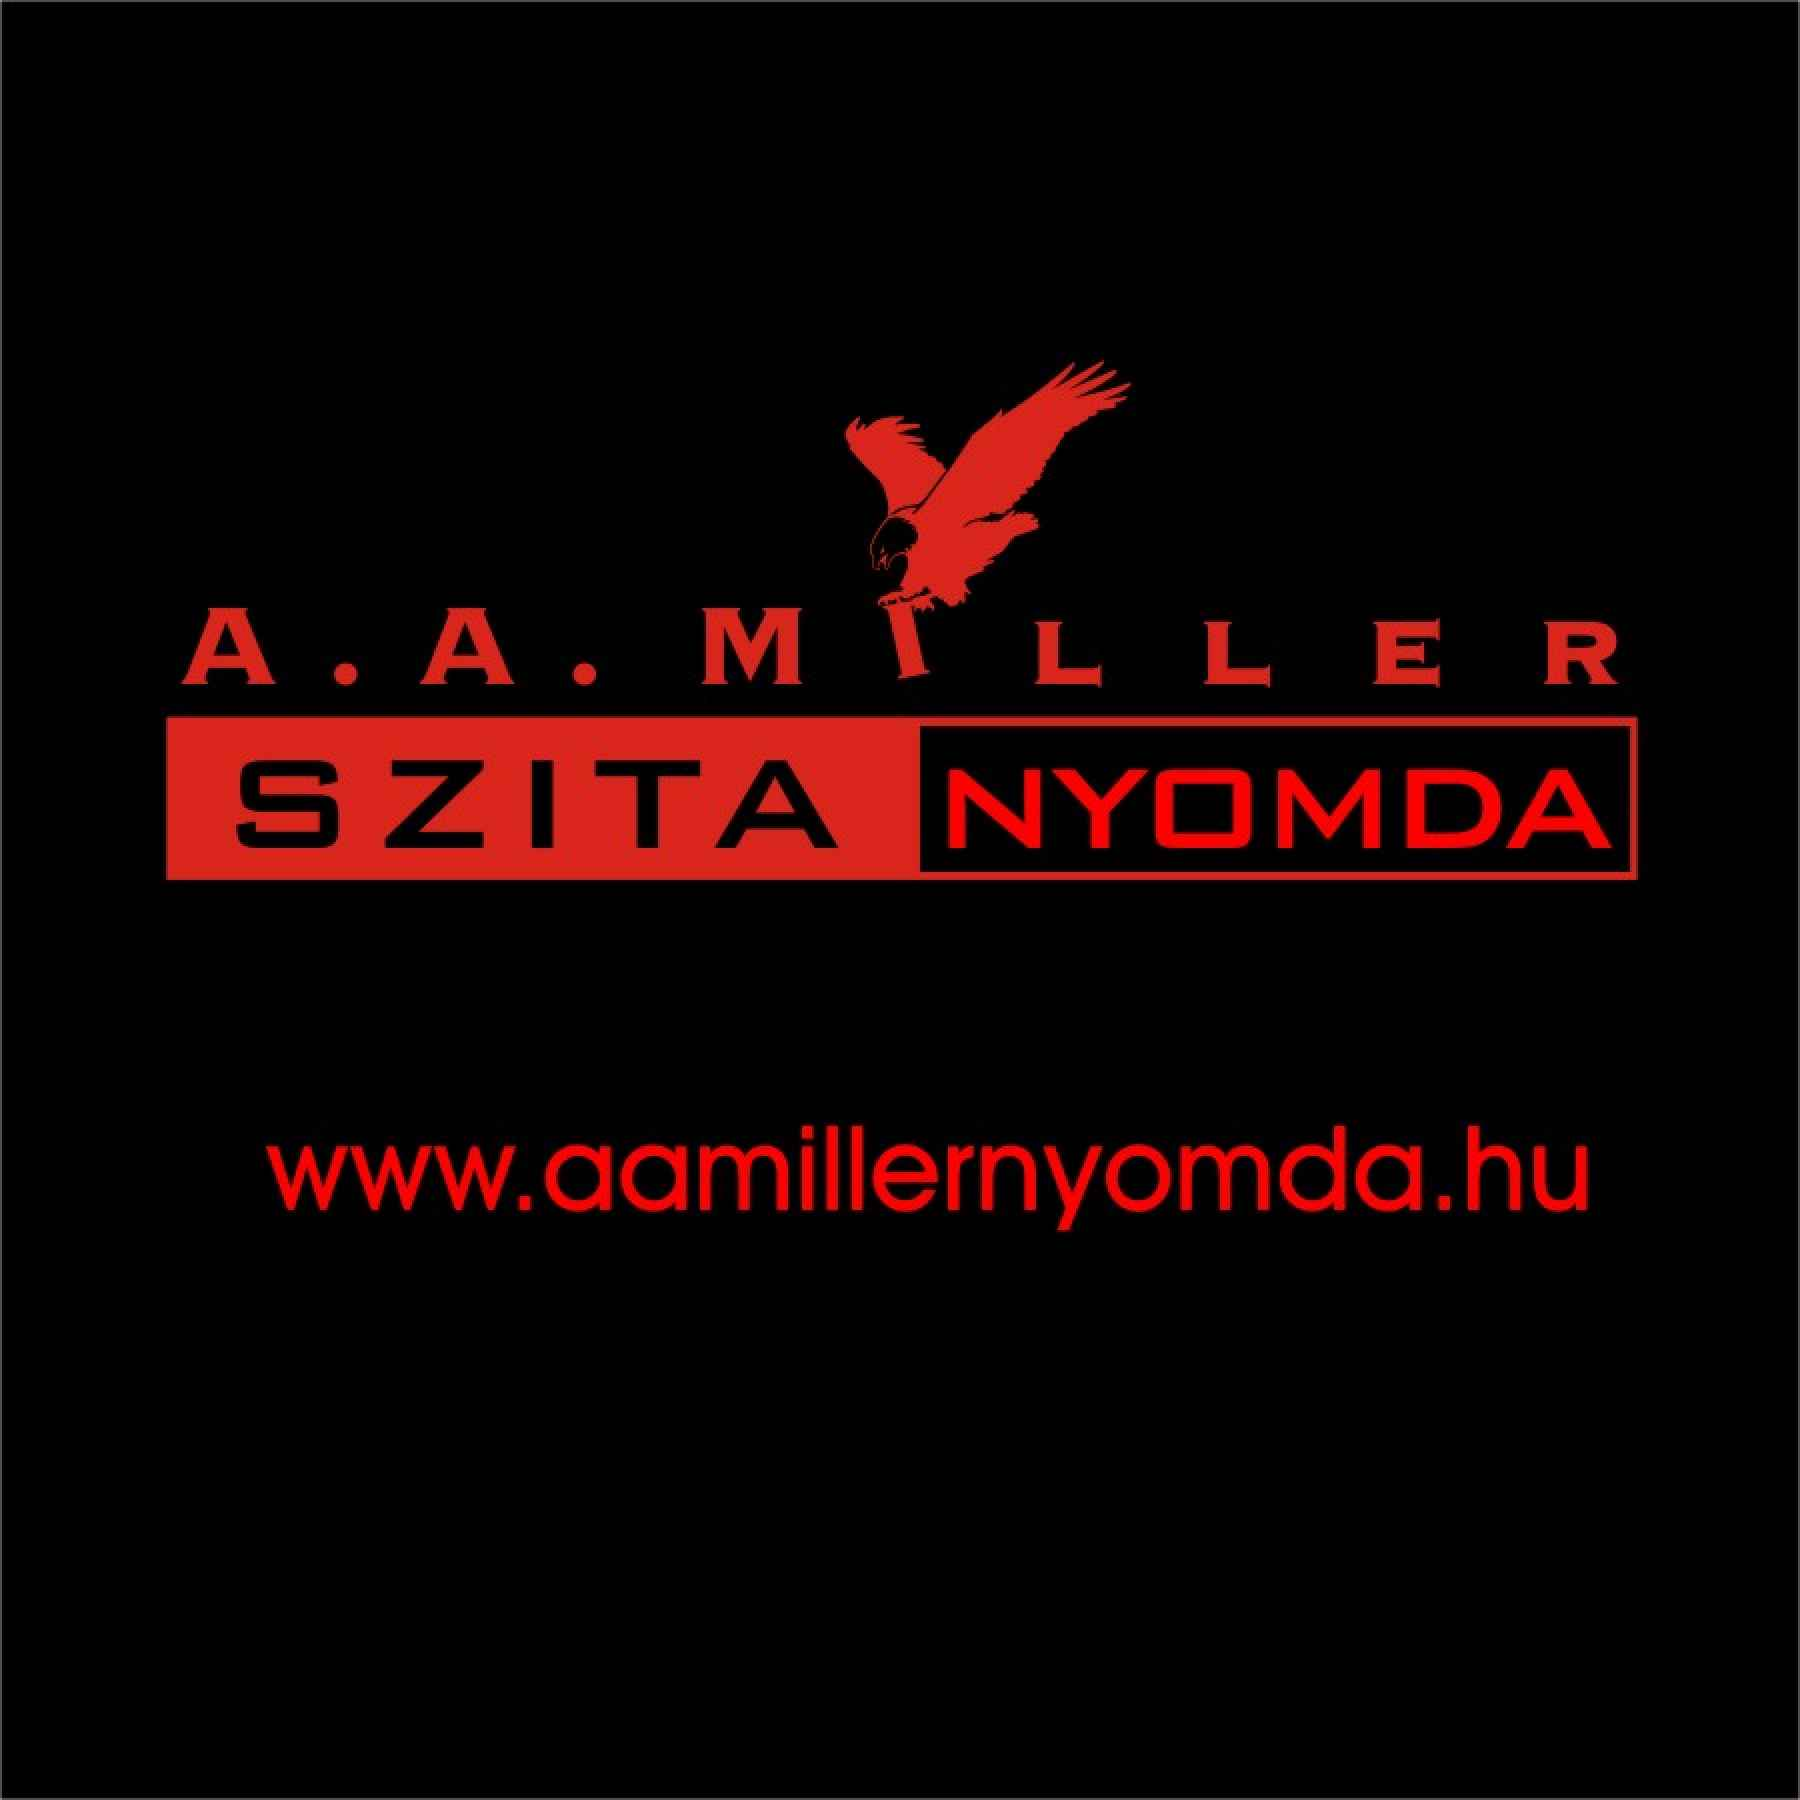 A.A. Miller Nyomda logója